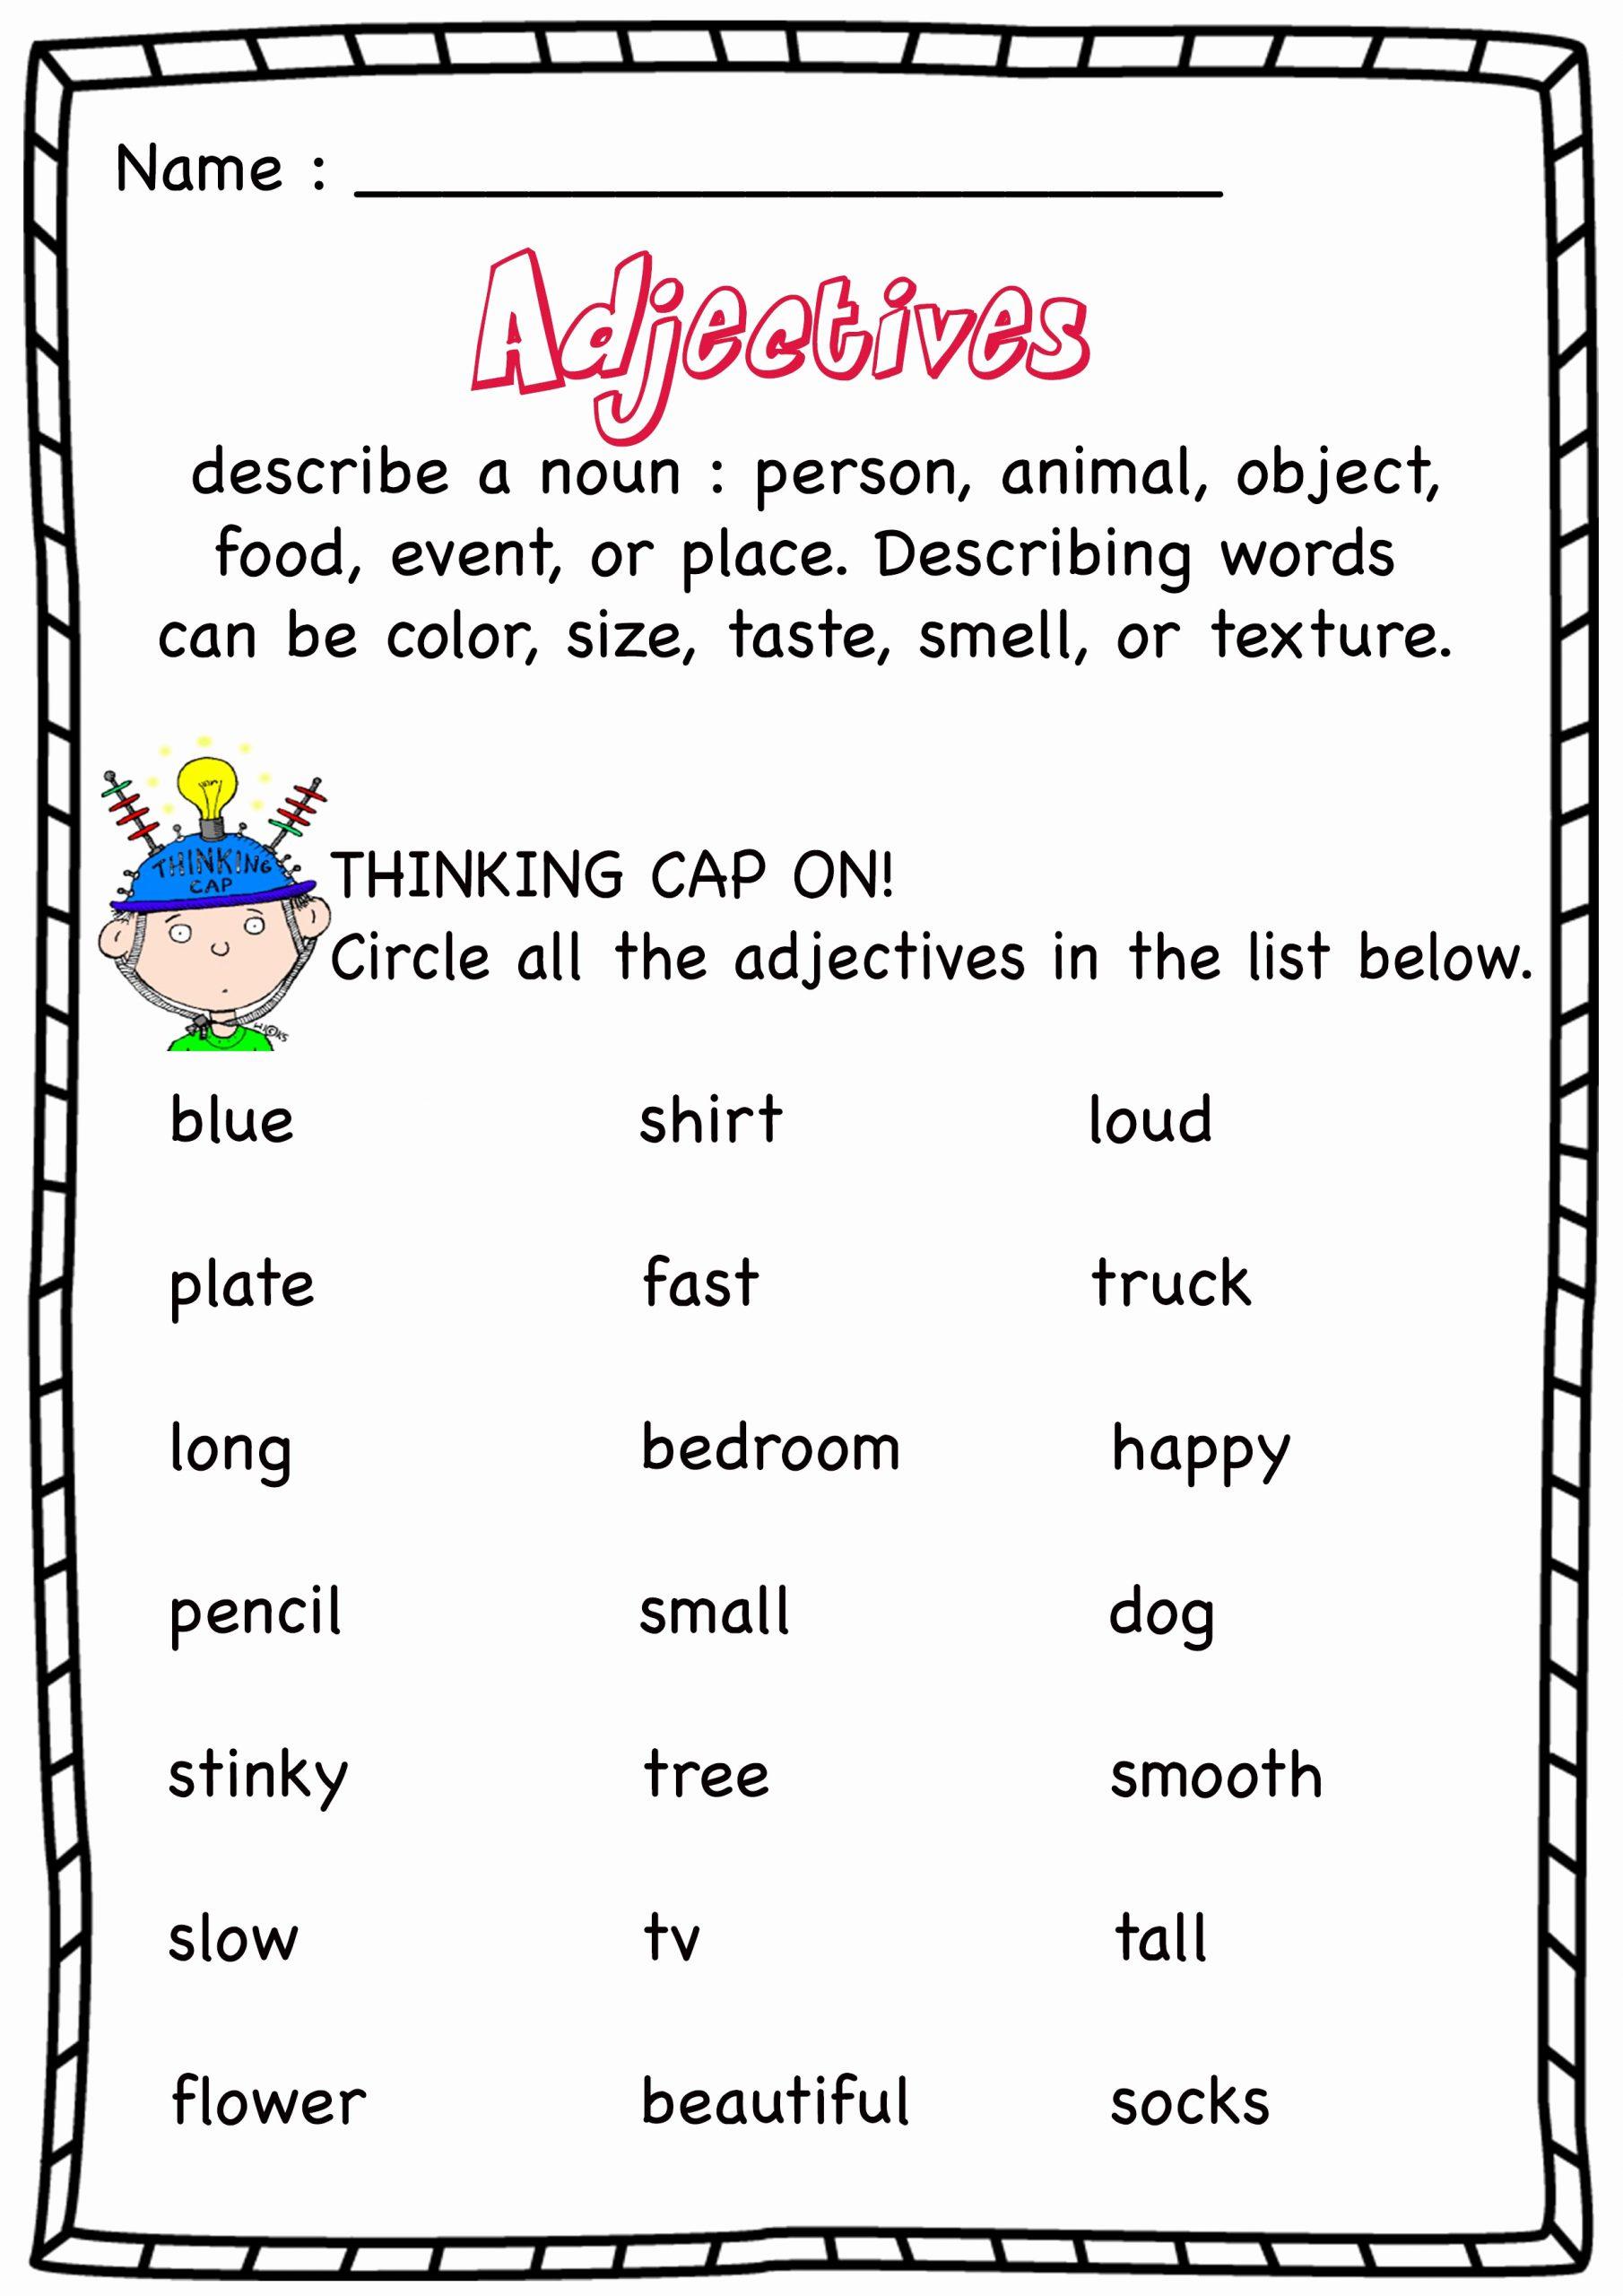 Free Printable Adjective Worksheets Lovely Worksheet Find the Adjectives